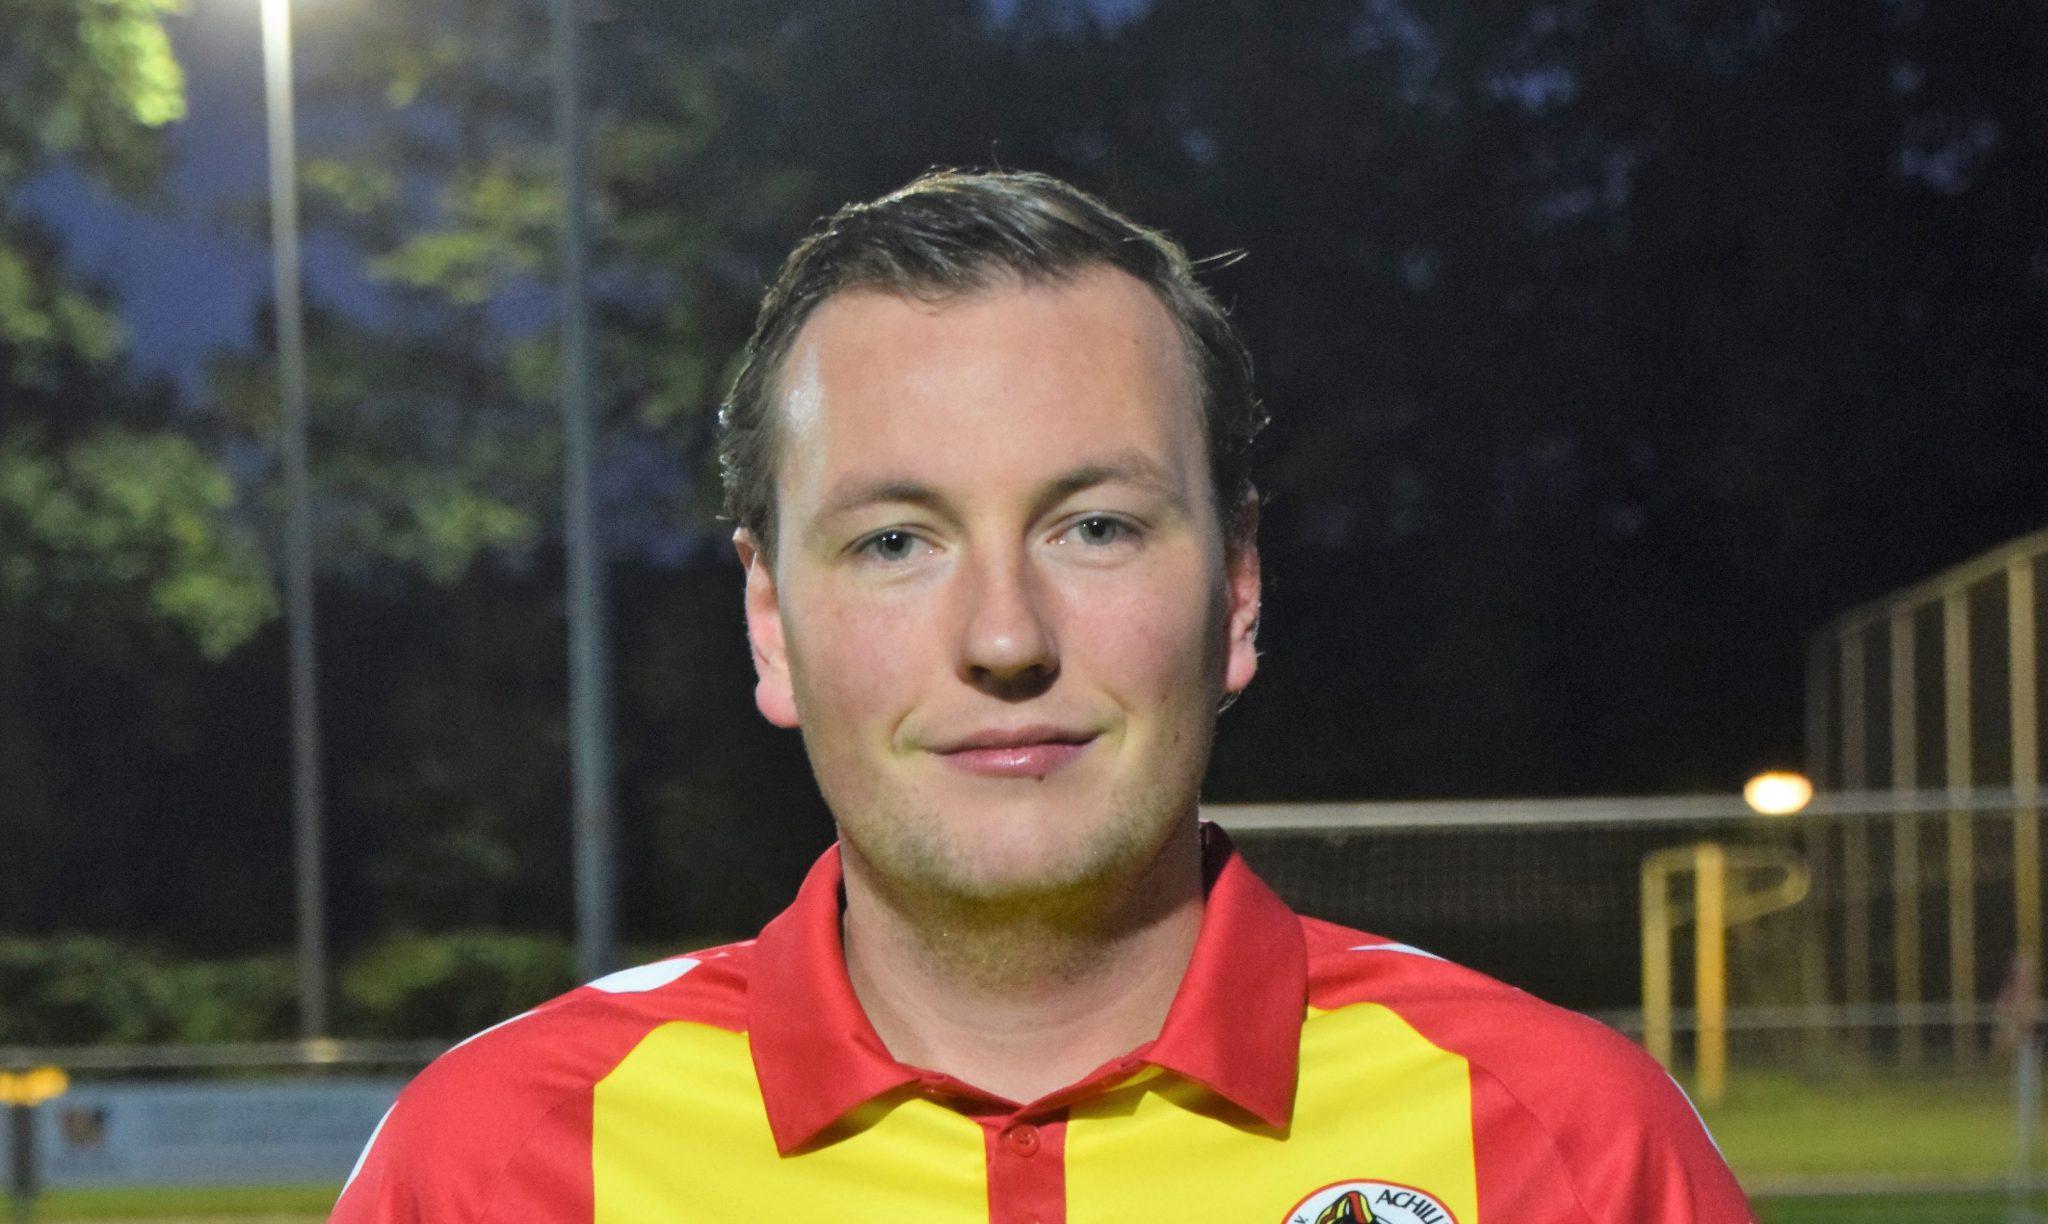 Thijs Bos: 'Laat die tegenstanders maar komen!'